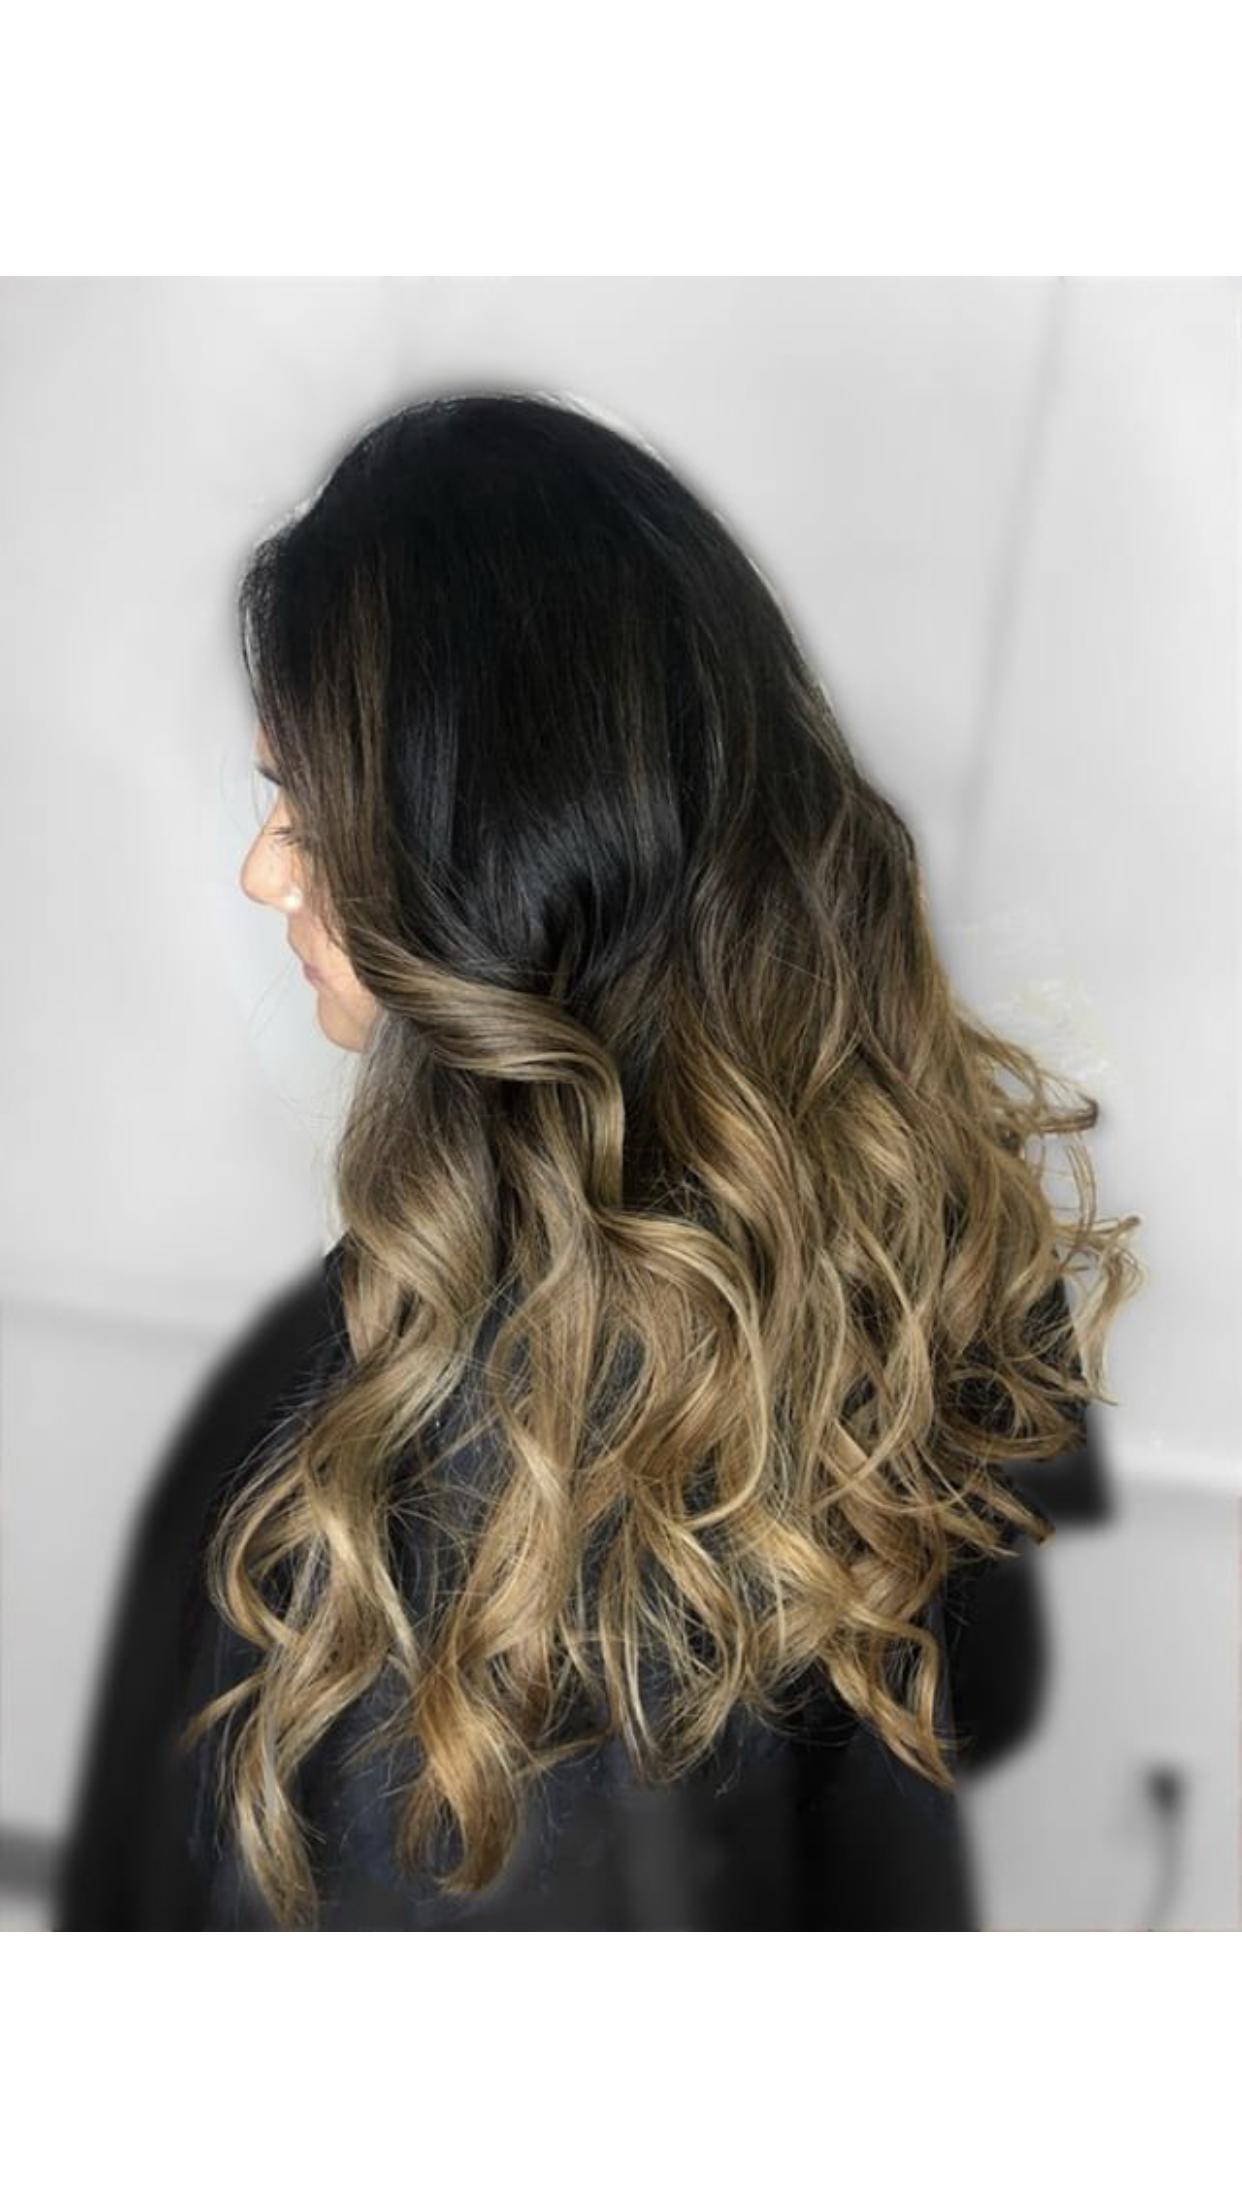 Top balayage color for dark hair, dark hair, summer color, gets ...